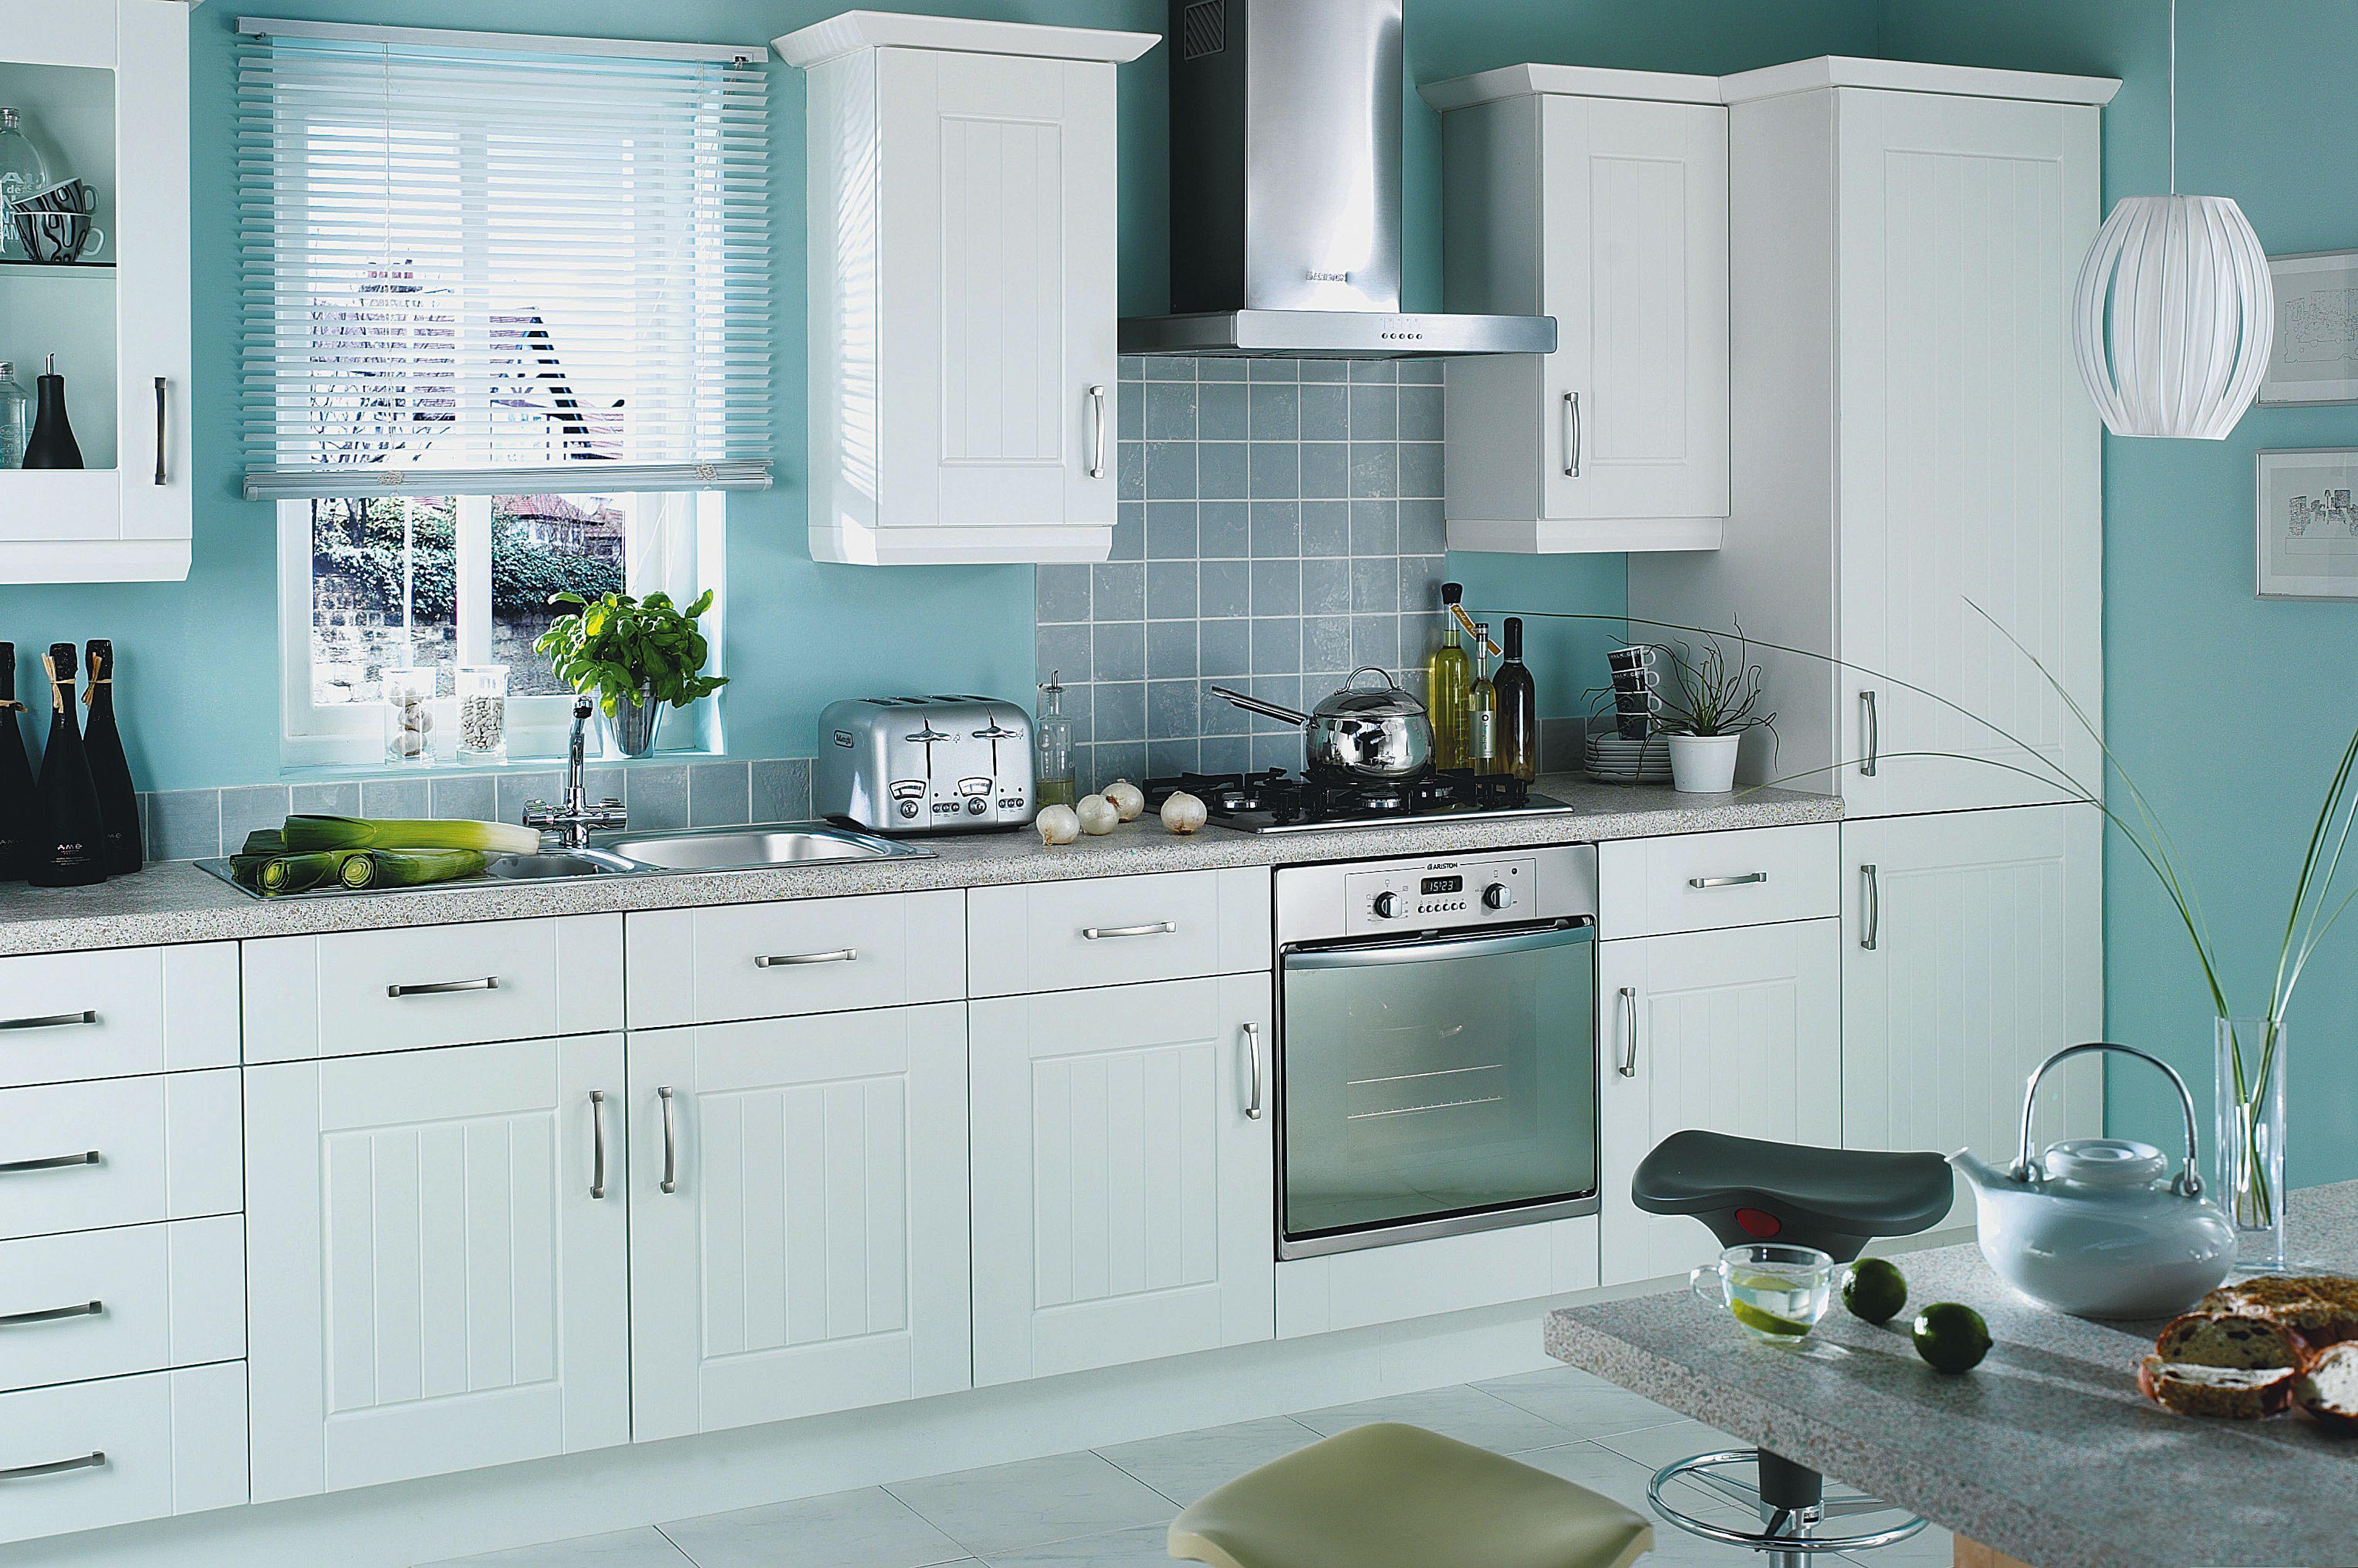 White kitchen with colour accent | kitchens | Pinterest | Color ...